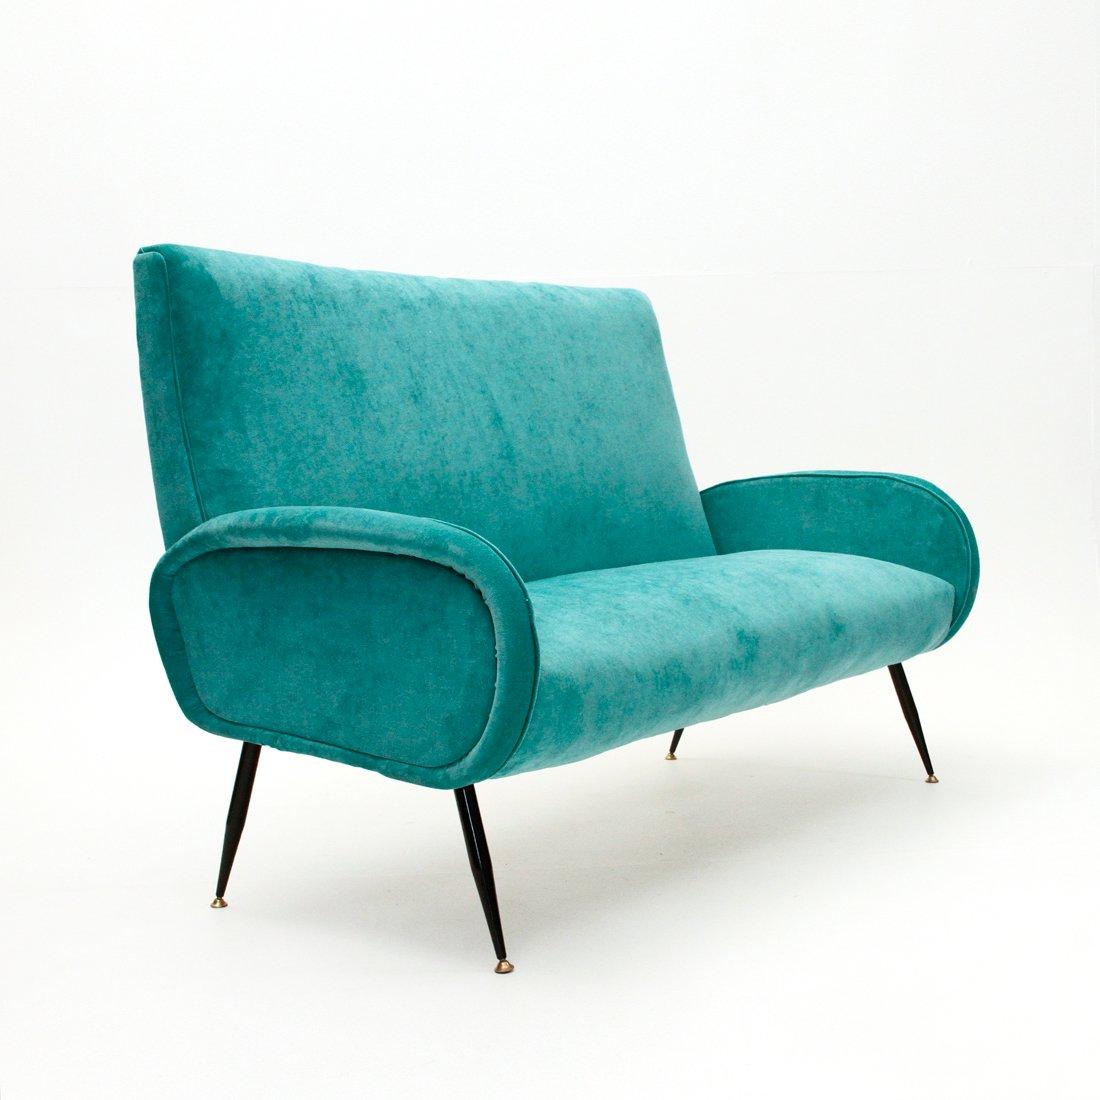 italienisches mid century samtsofa 1950er bei pamono kaufen. Black Bedroom Furniture Sets. Home Design Ideas